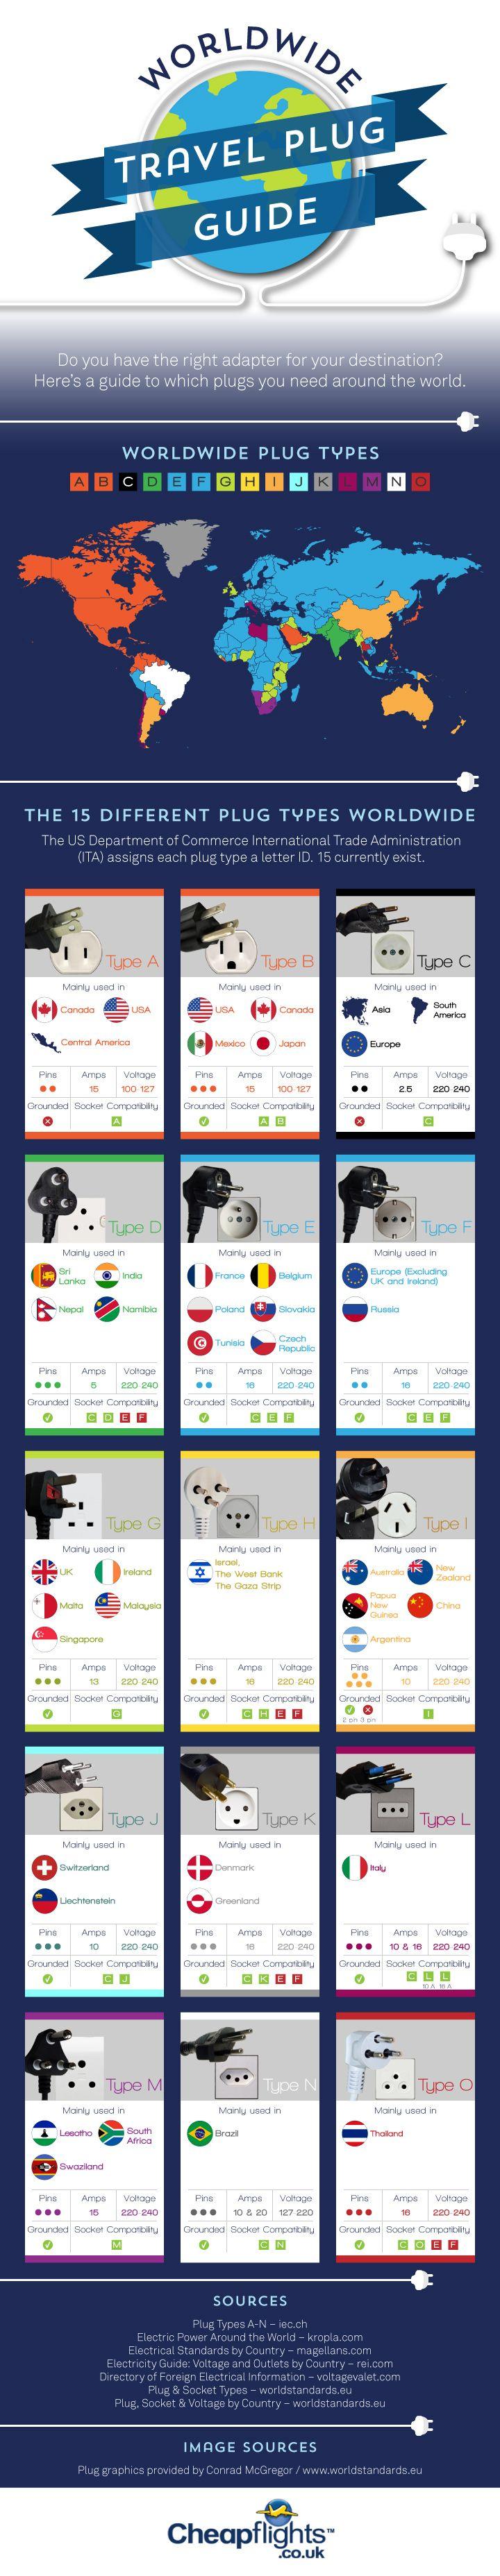 Worldwide Travel Plug Guide - Infographic